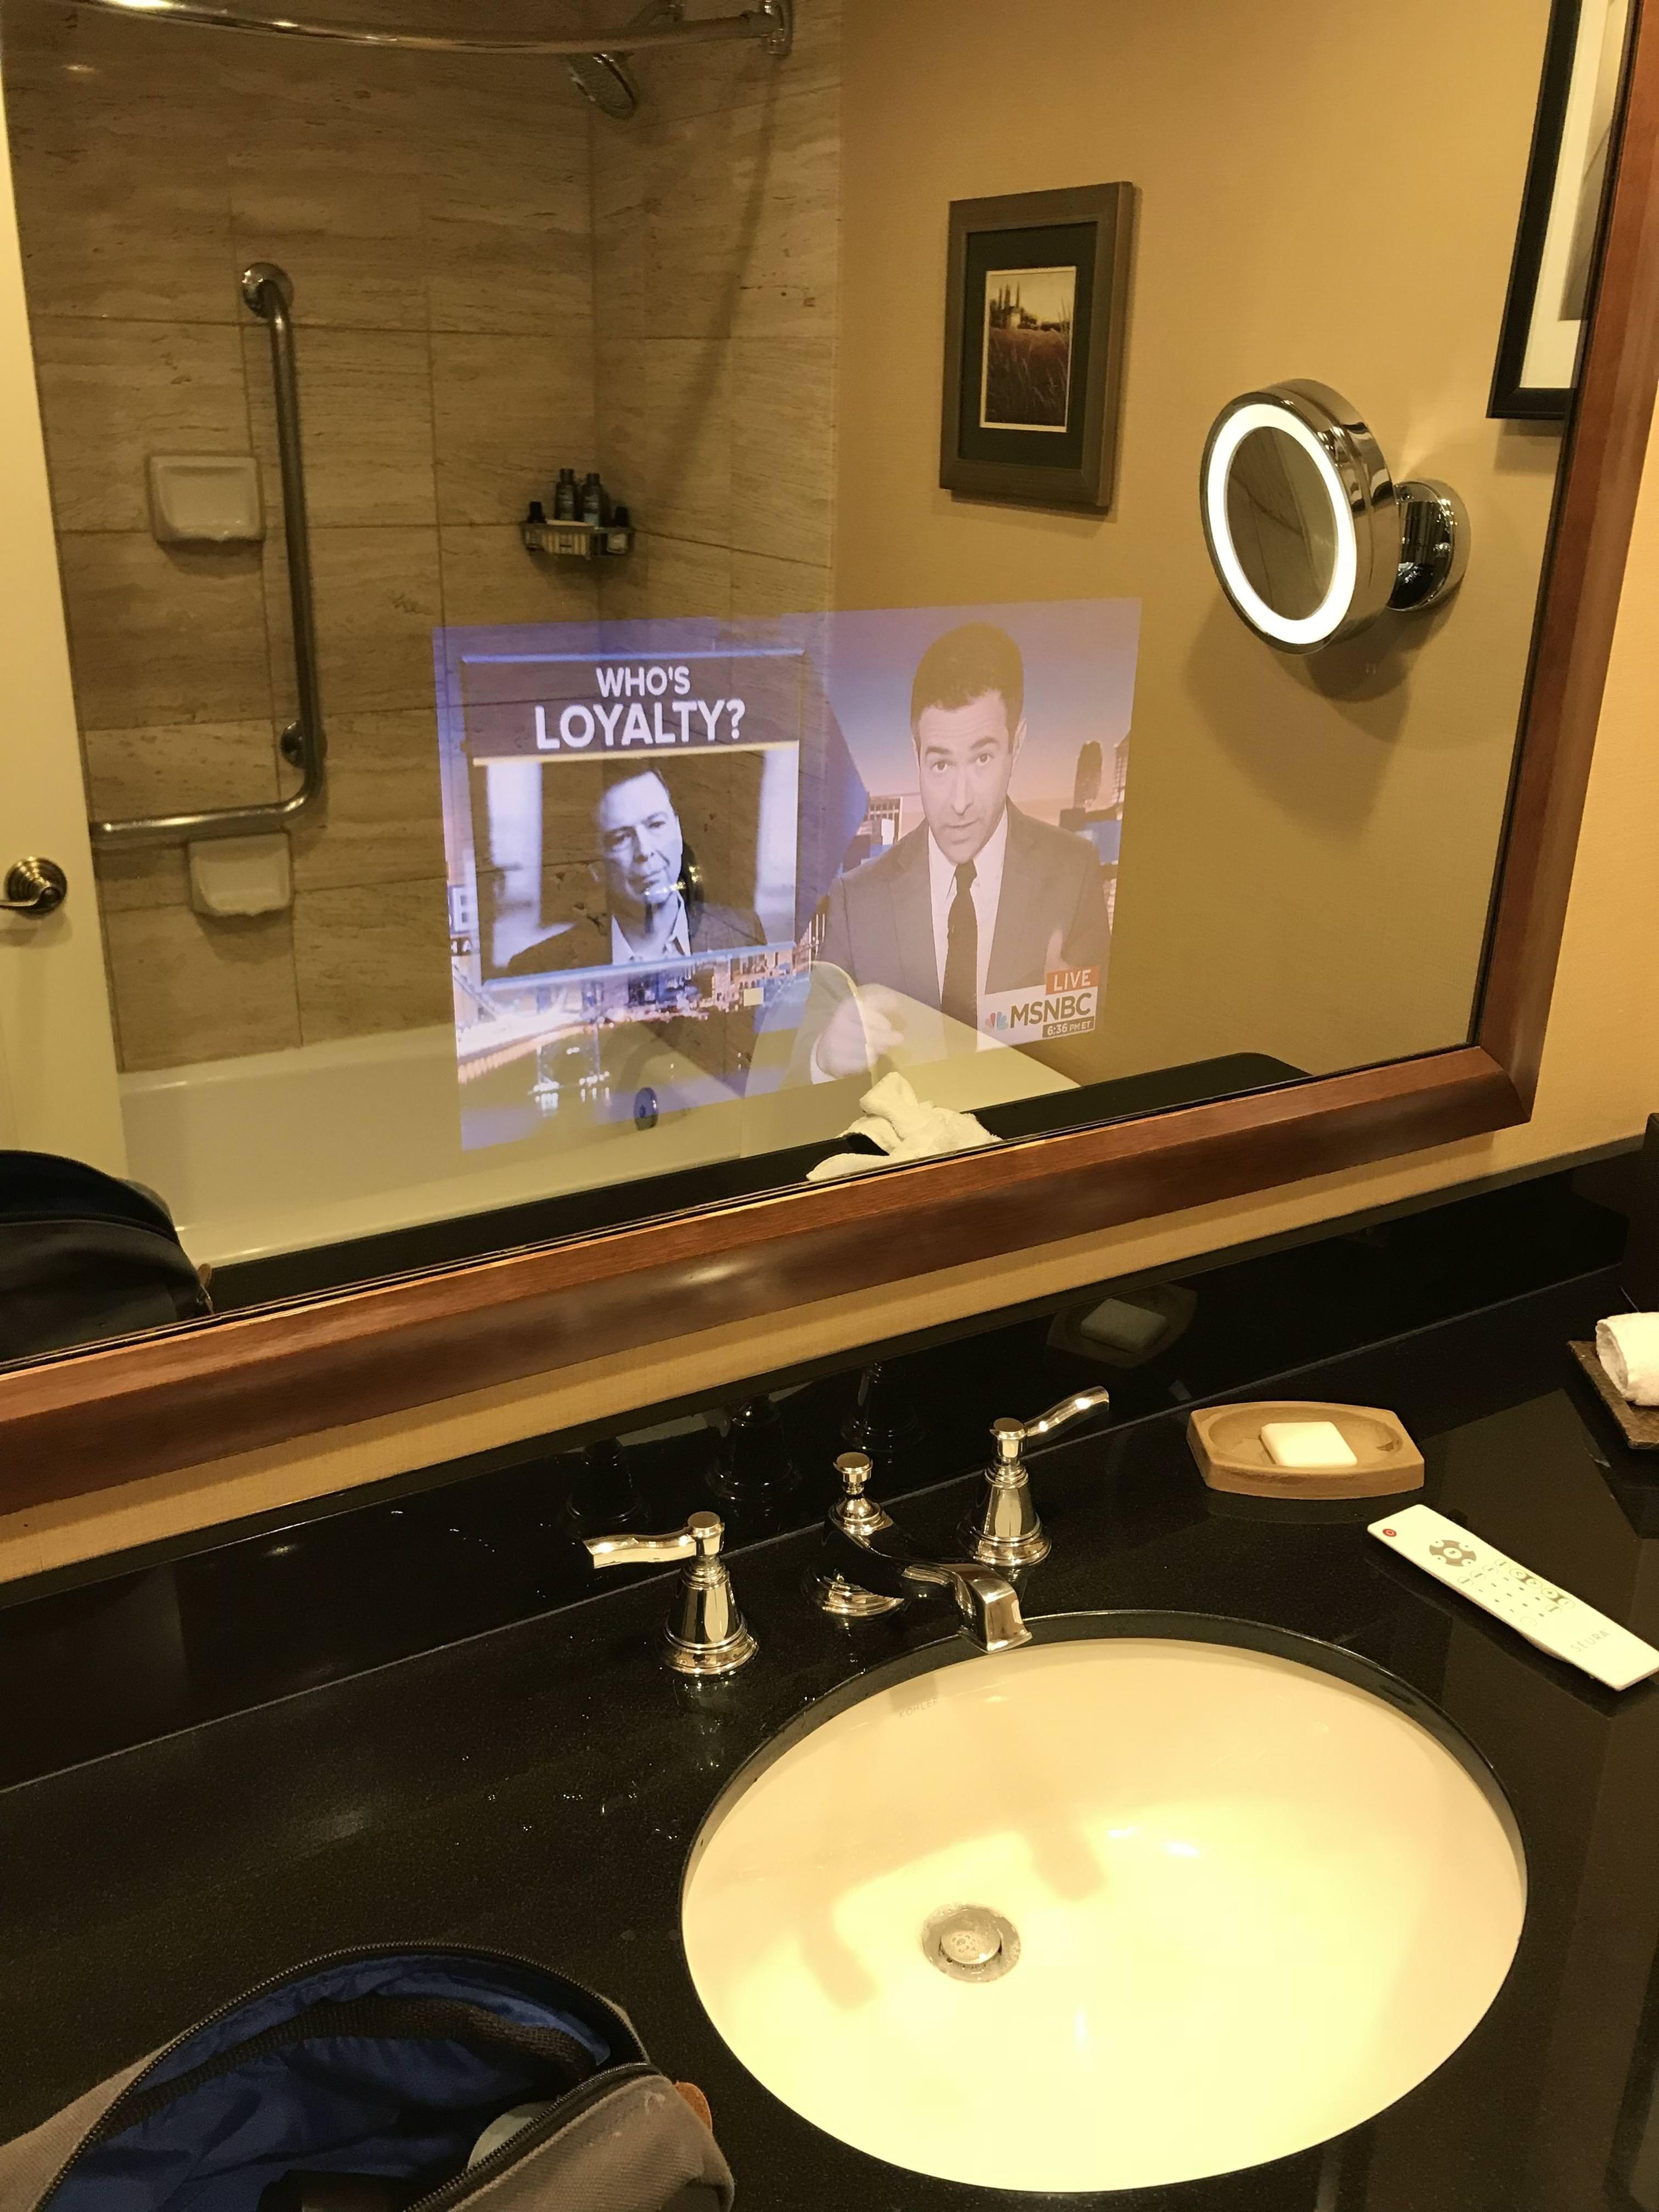 My Hotel Room Has A Tv Inside The Bathroom Mirror Hotels Room Bathroom Mirror Mirror